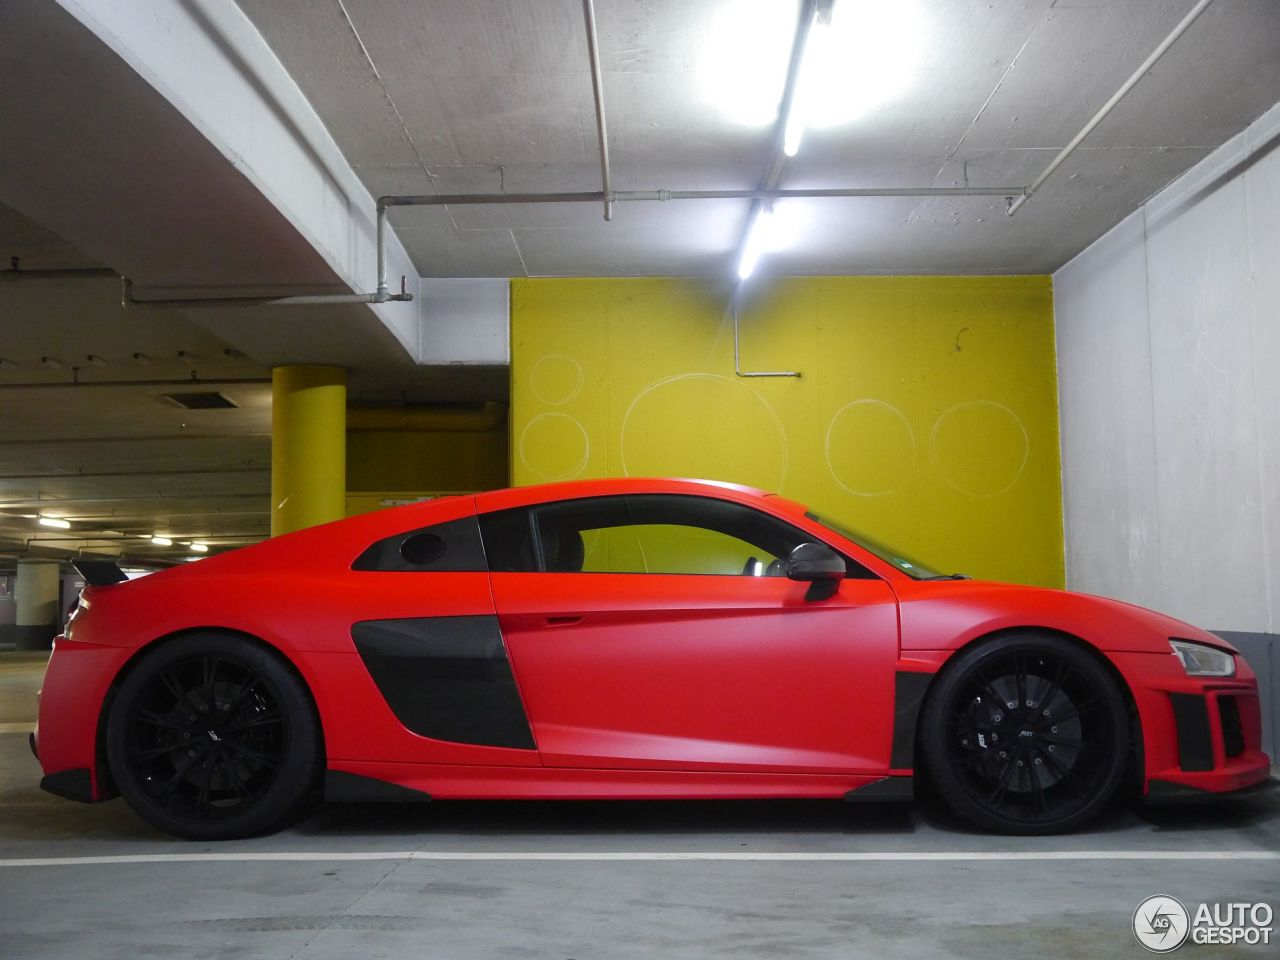 Audi R8 V10 Plus 2015 Abt 2 May 2017 Autogespot